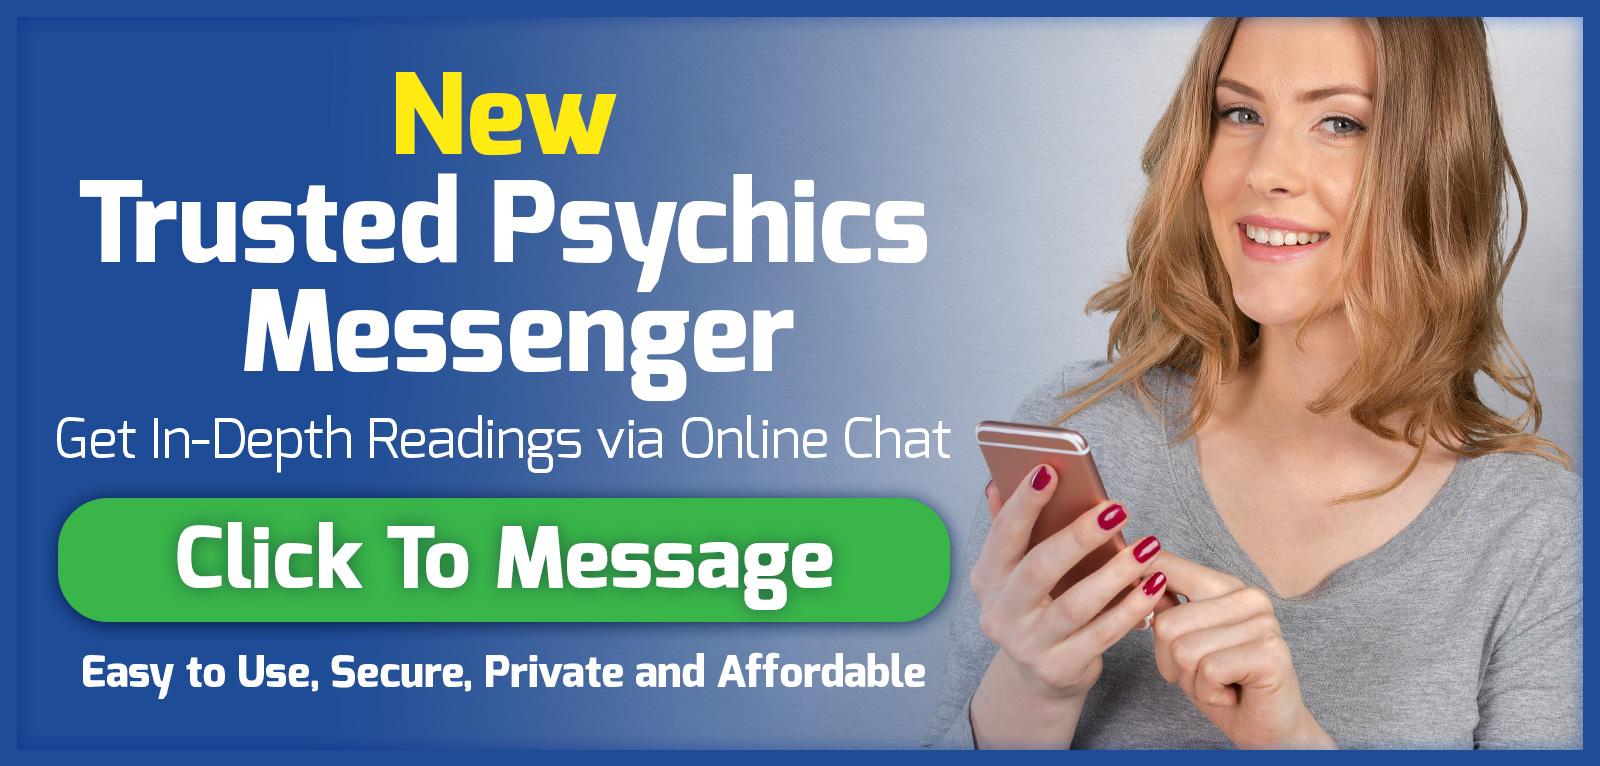 New Psychic Messenger Service